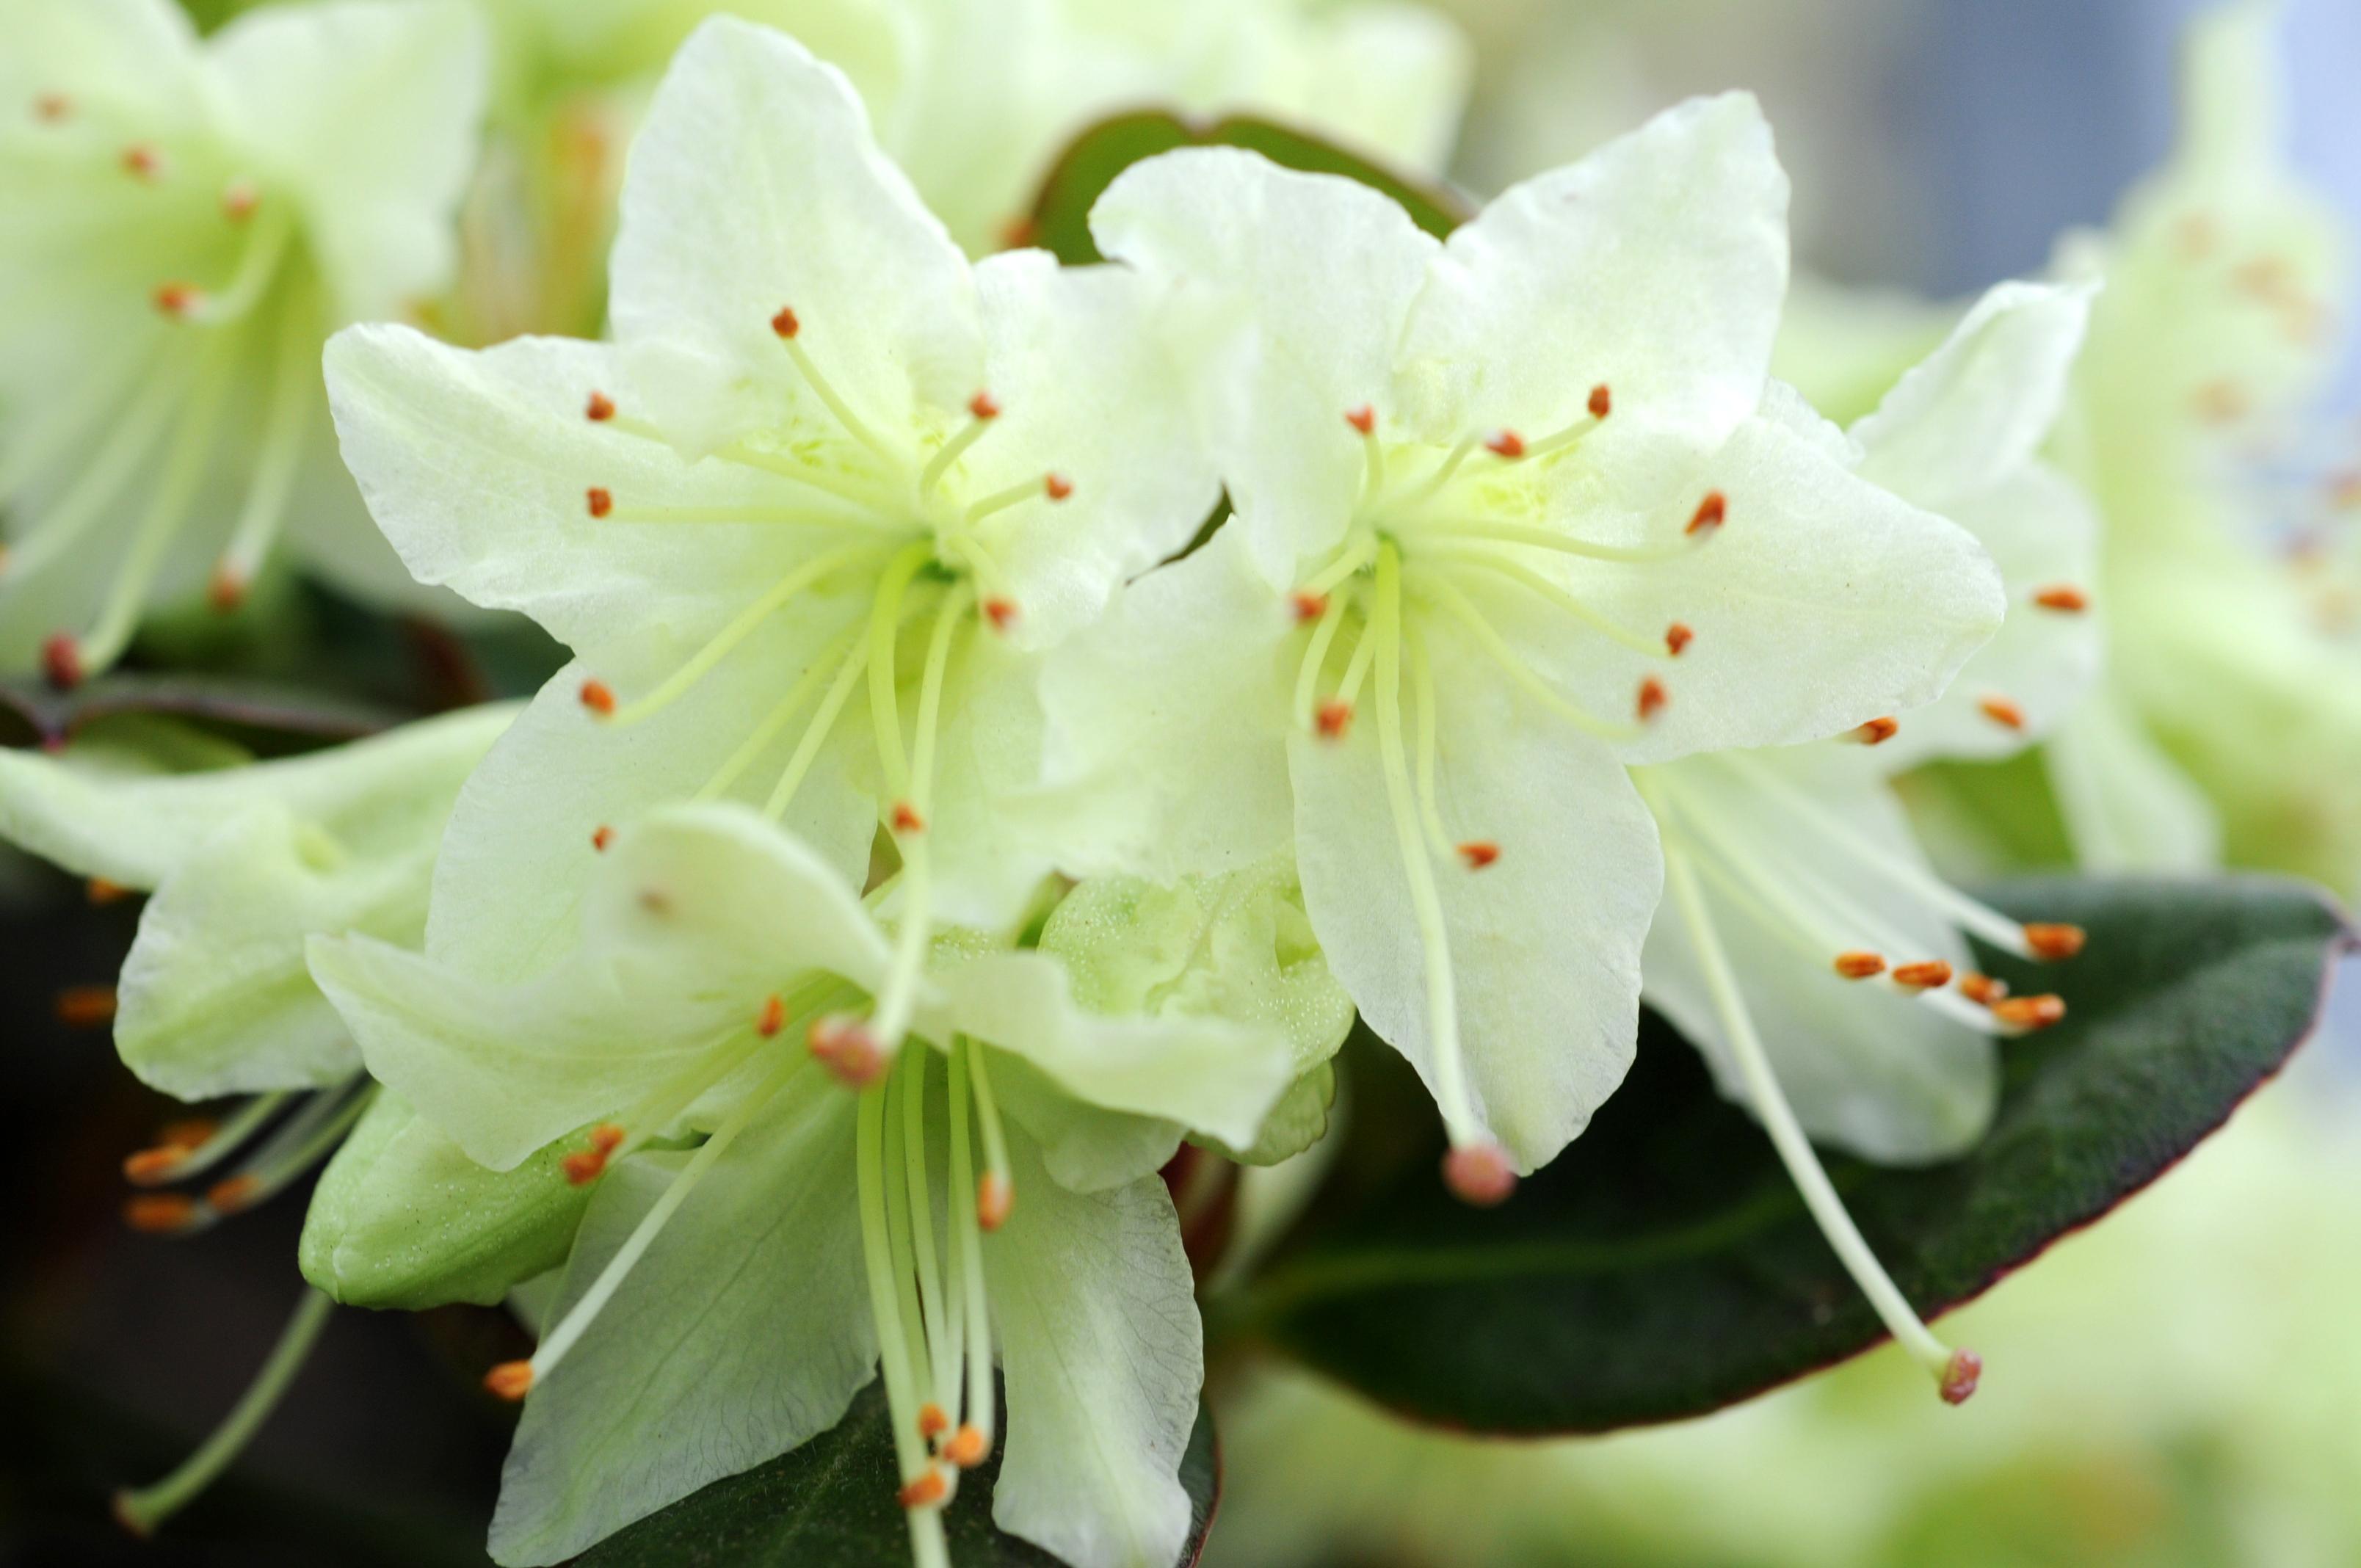 Rhododendron_shamrock_0451